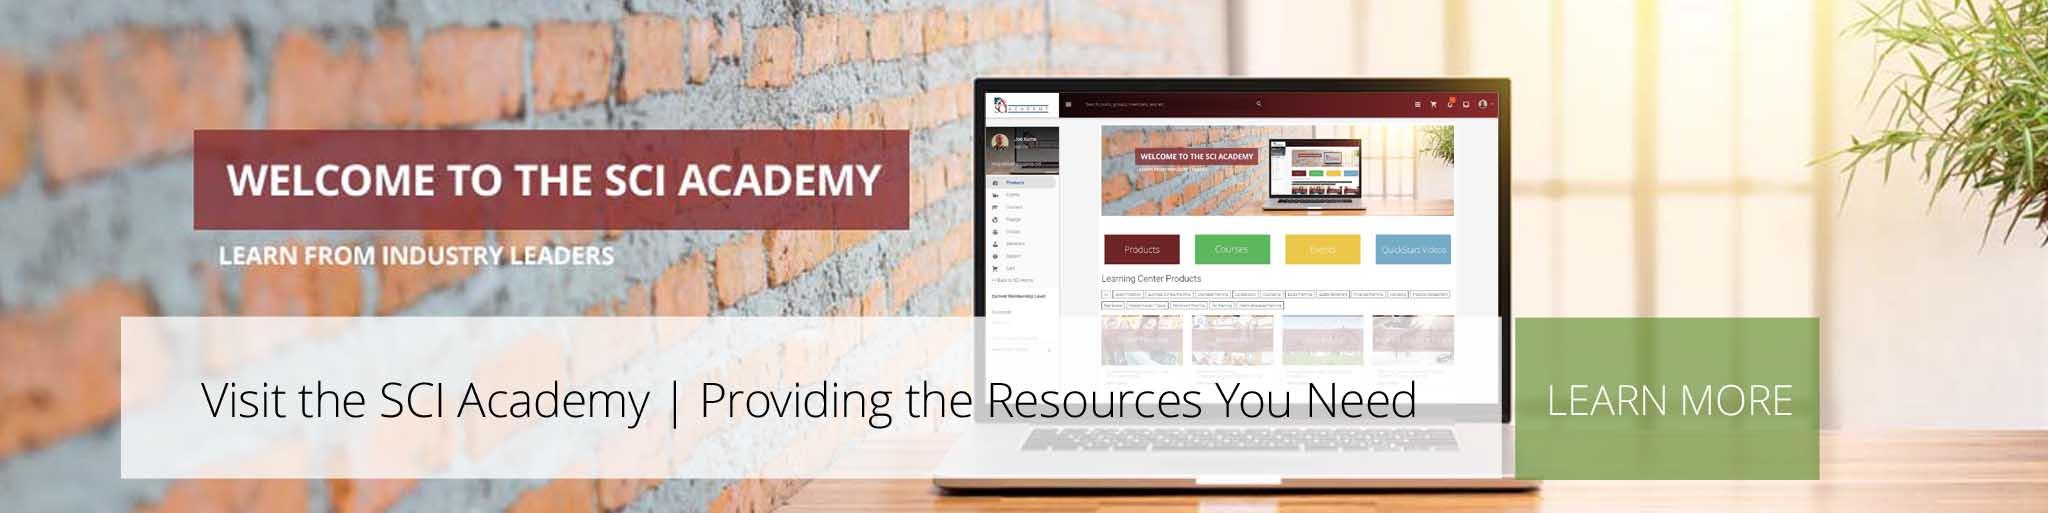 SCI ACADEMY – New slider banner image for main website